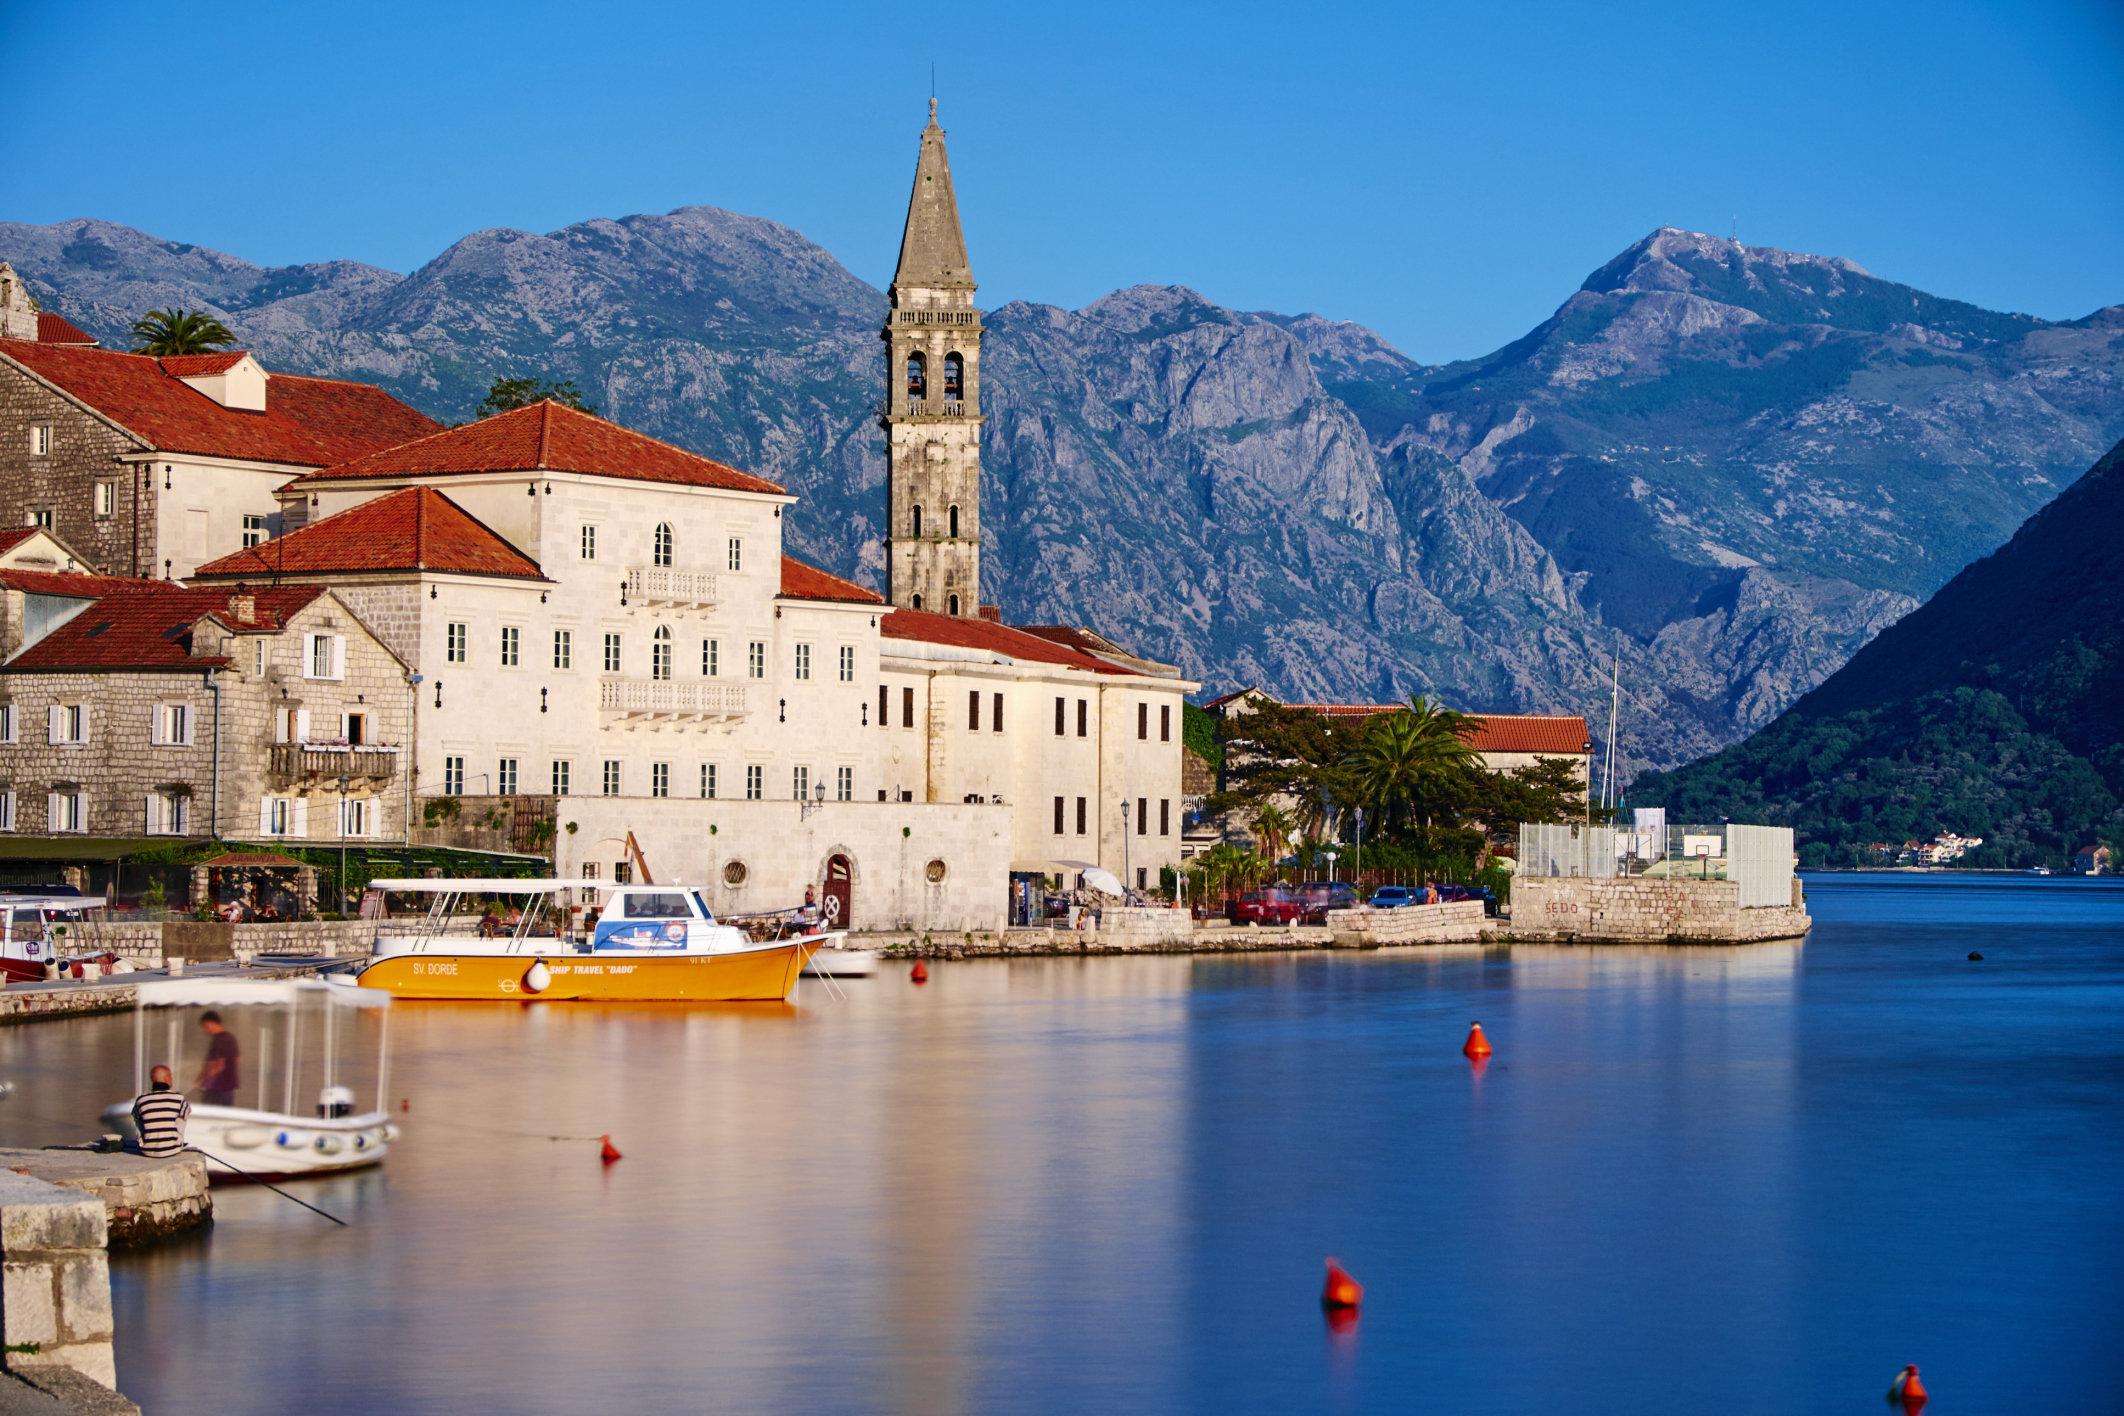 Montenegro, Adriatic coast, Bay of Kotor, Kotor, village of Perast, church tower